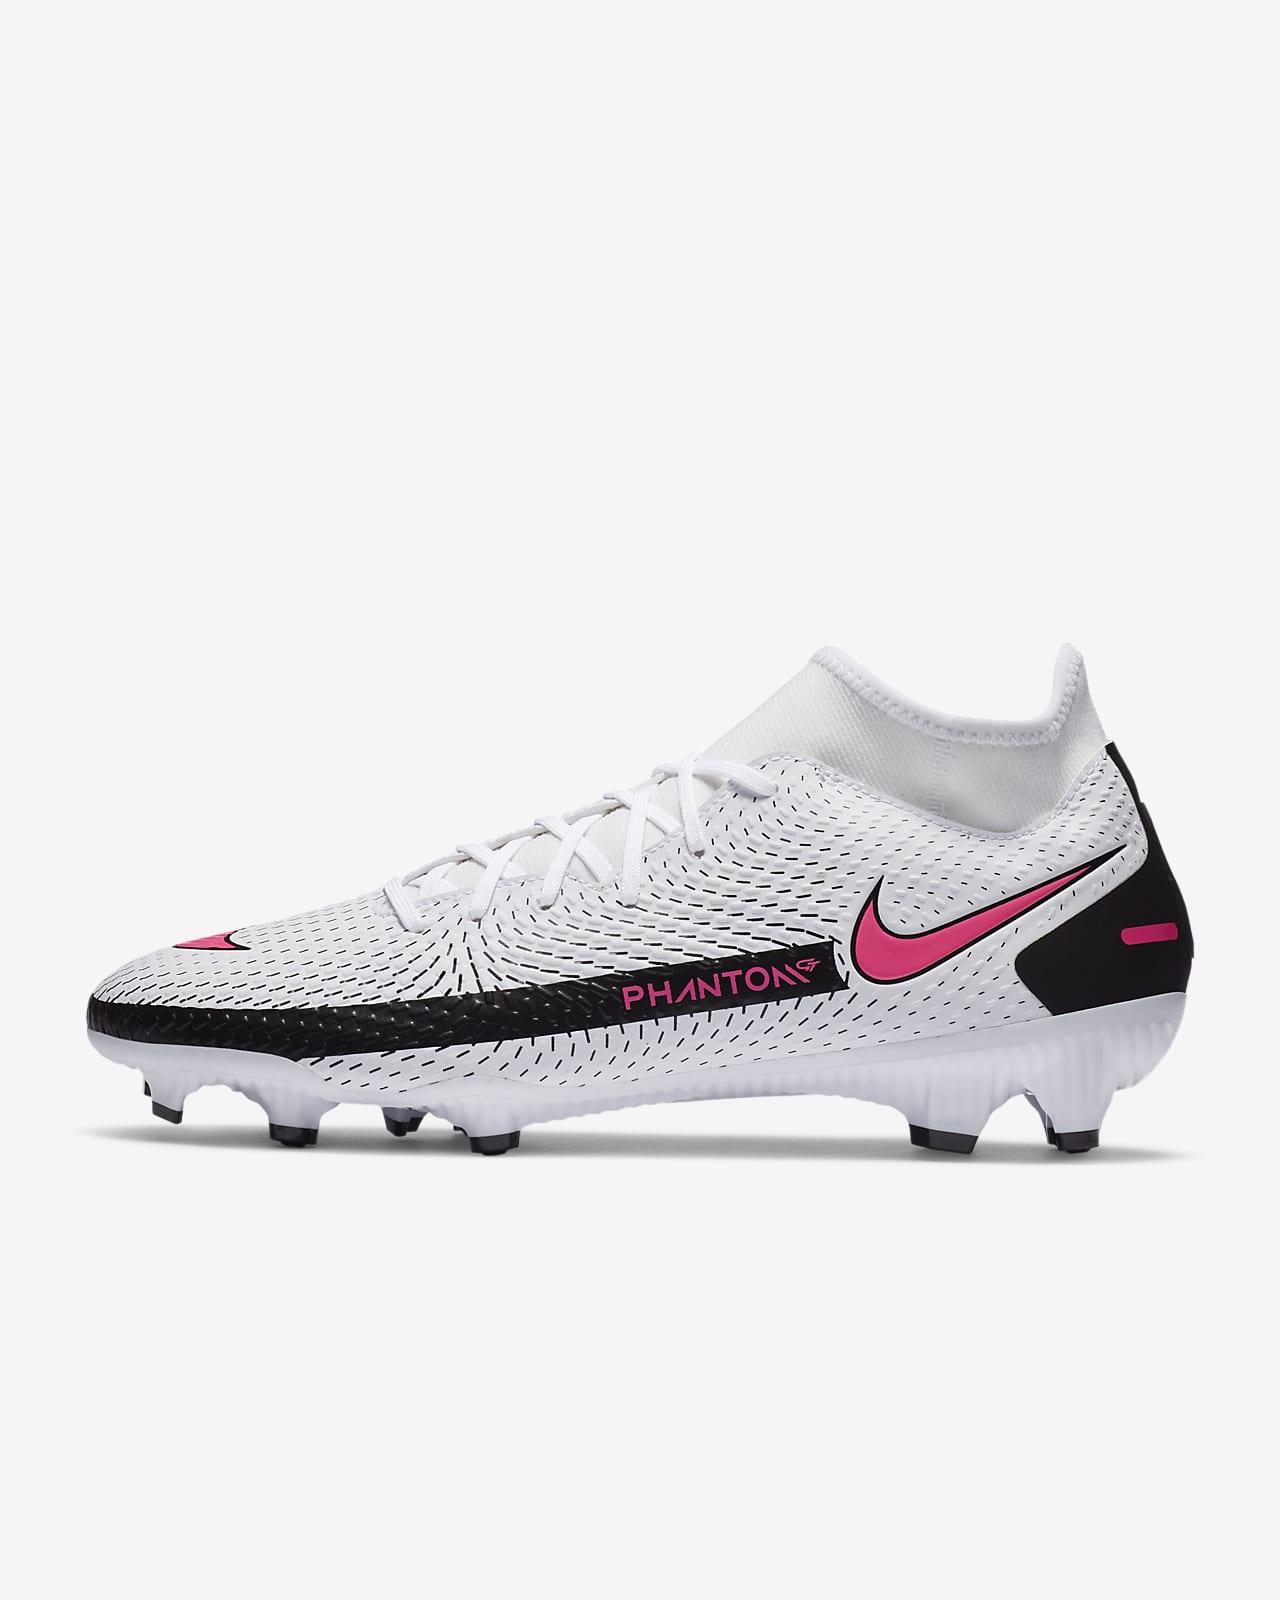 Nike Phantom GT Academy Dynamic Fit MG Multi-Ground Football Boot